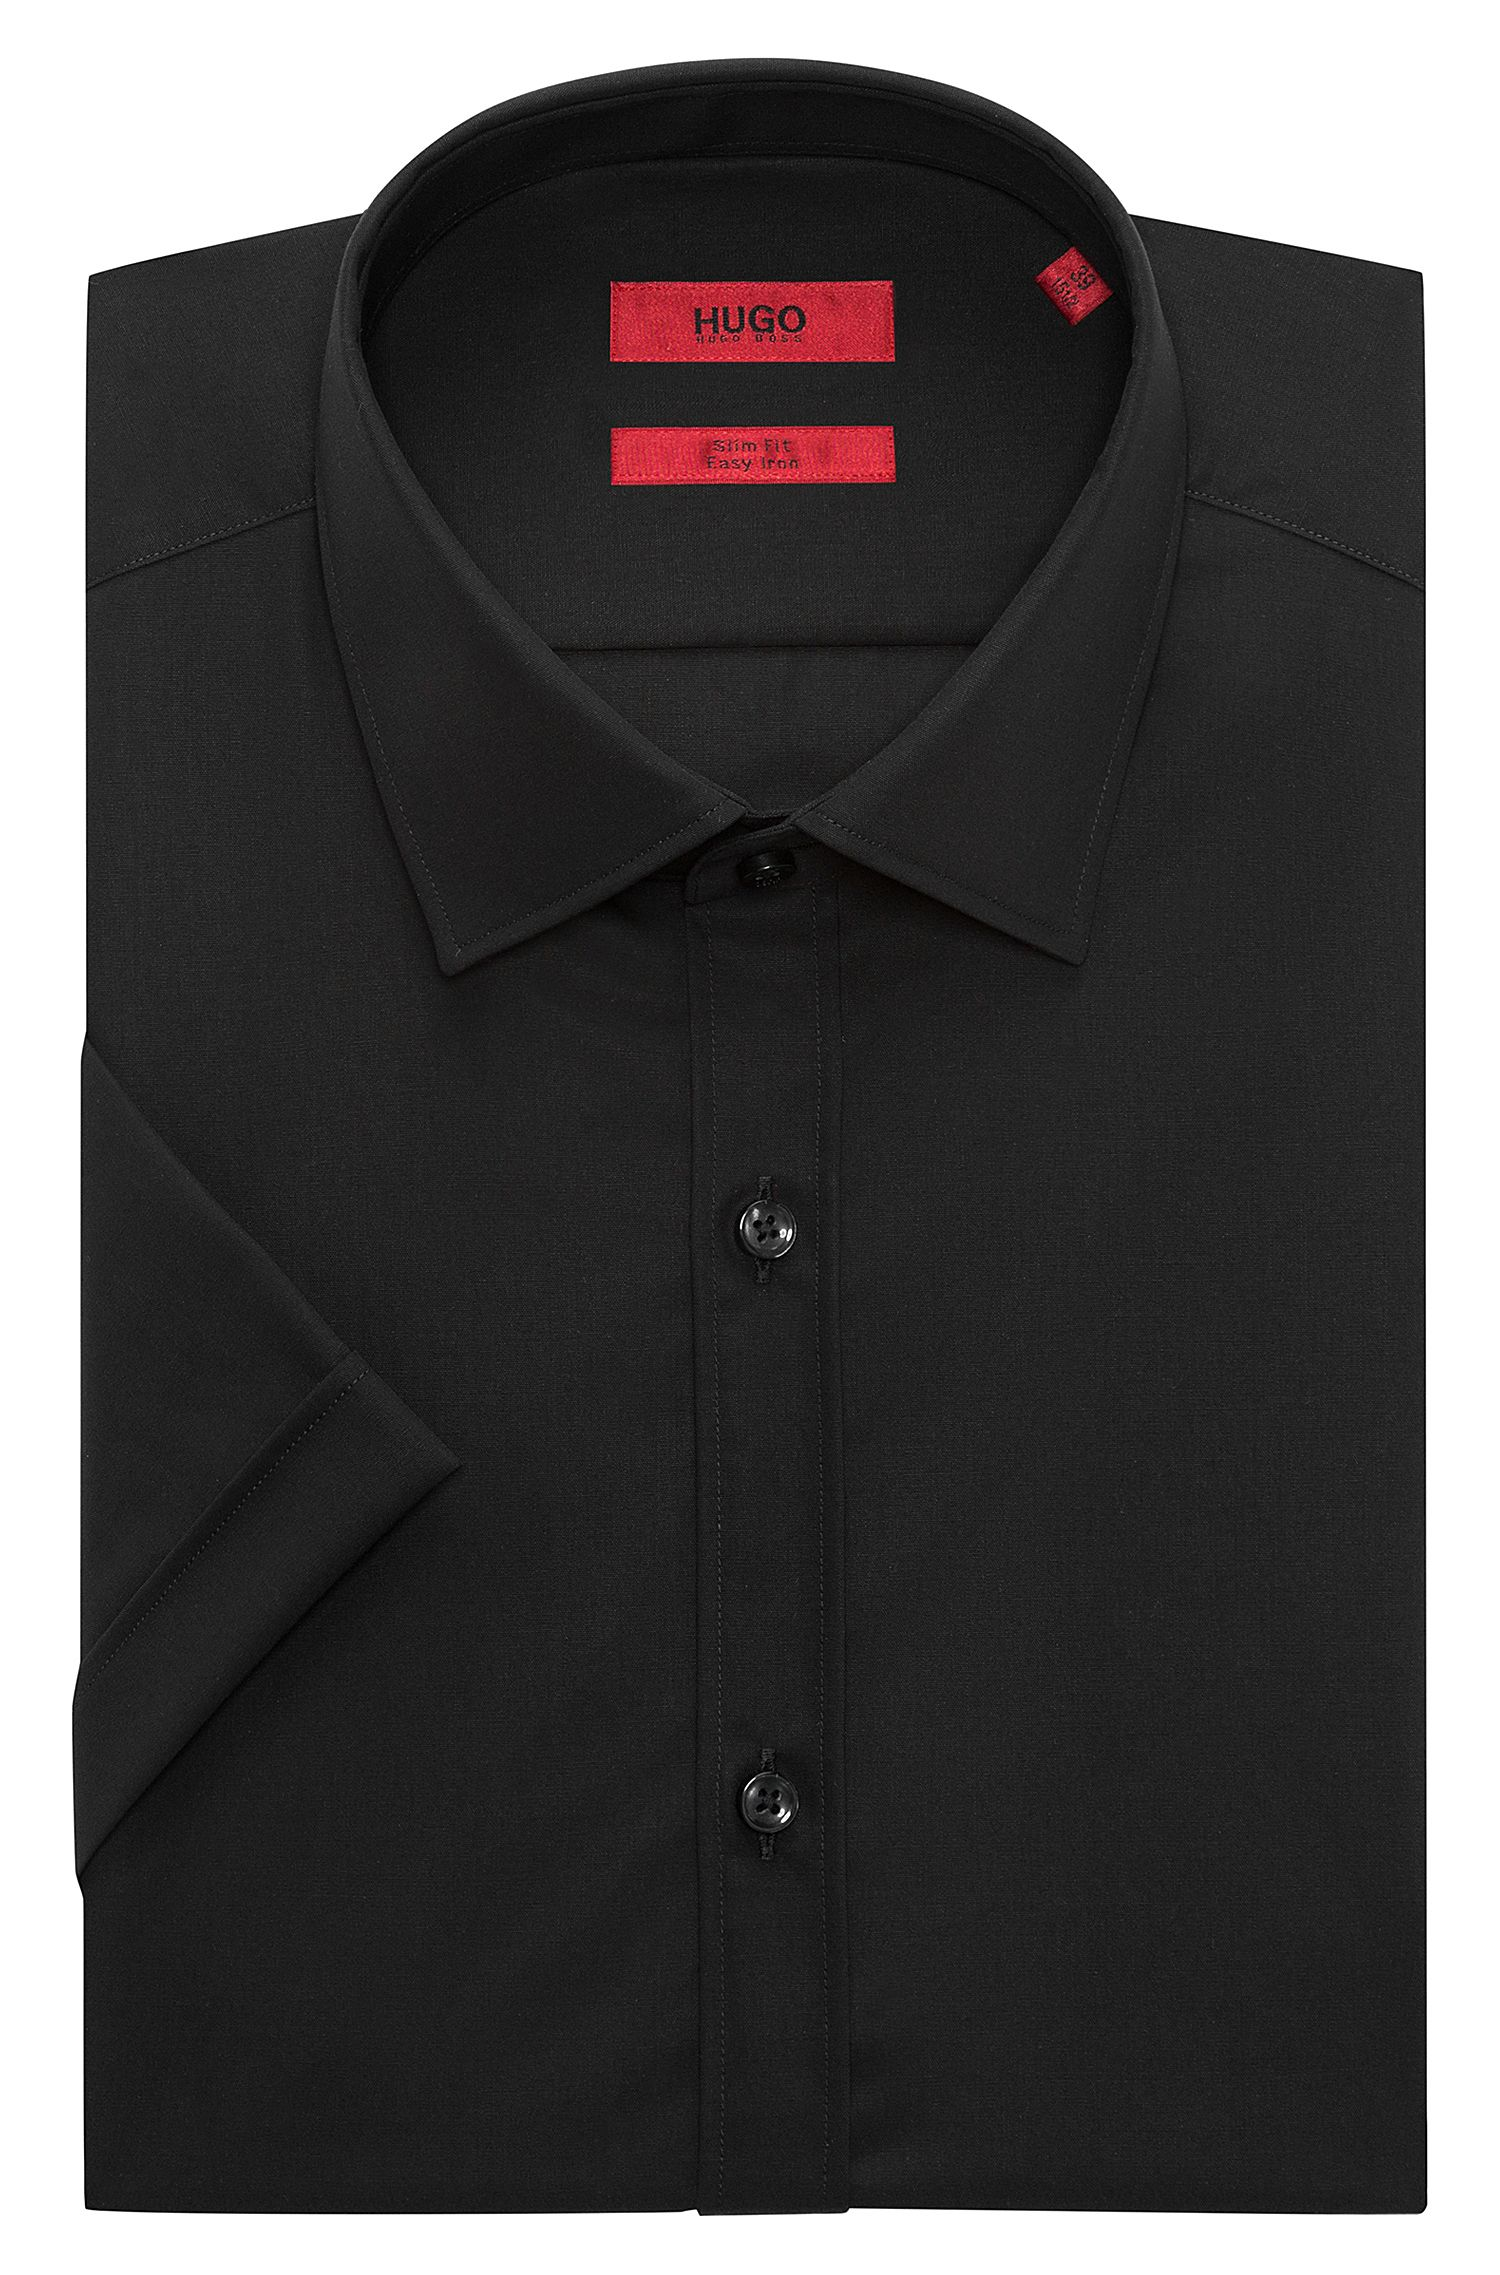 Camisa de manga corta slim fit en popelín de algodón